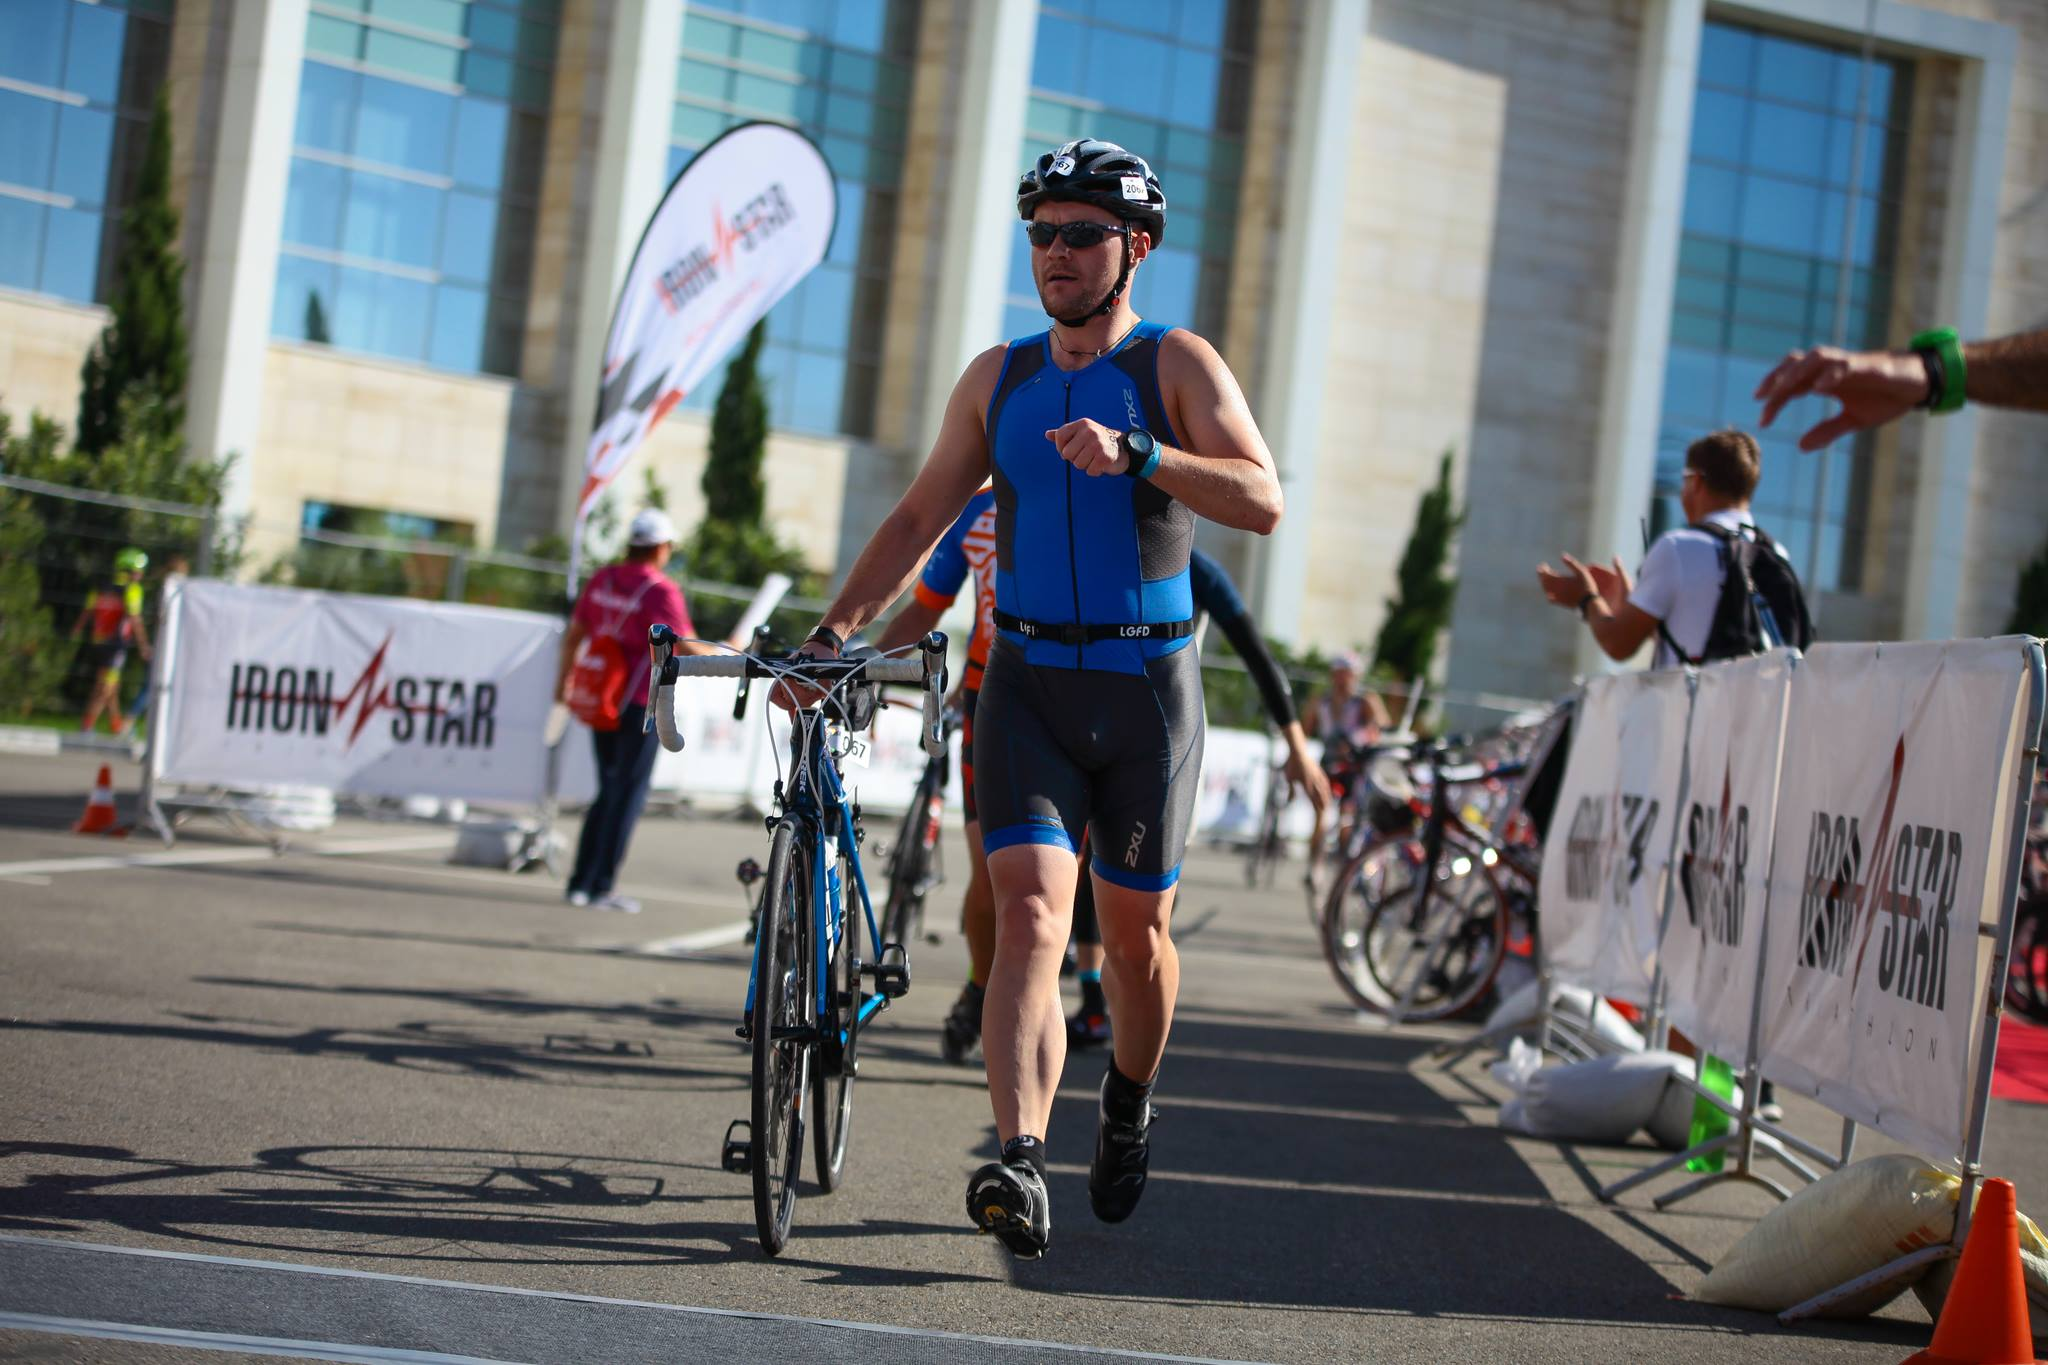 Выход из транзитки Ironstar Sochi Olympic triathlon